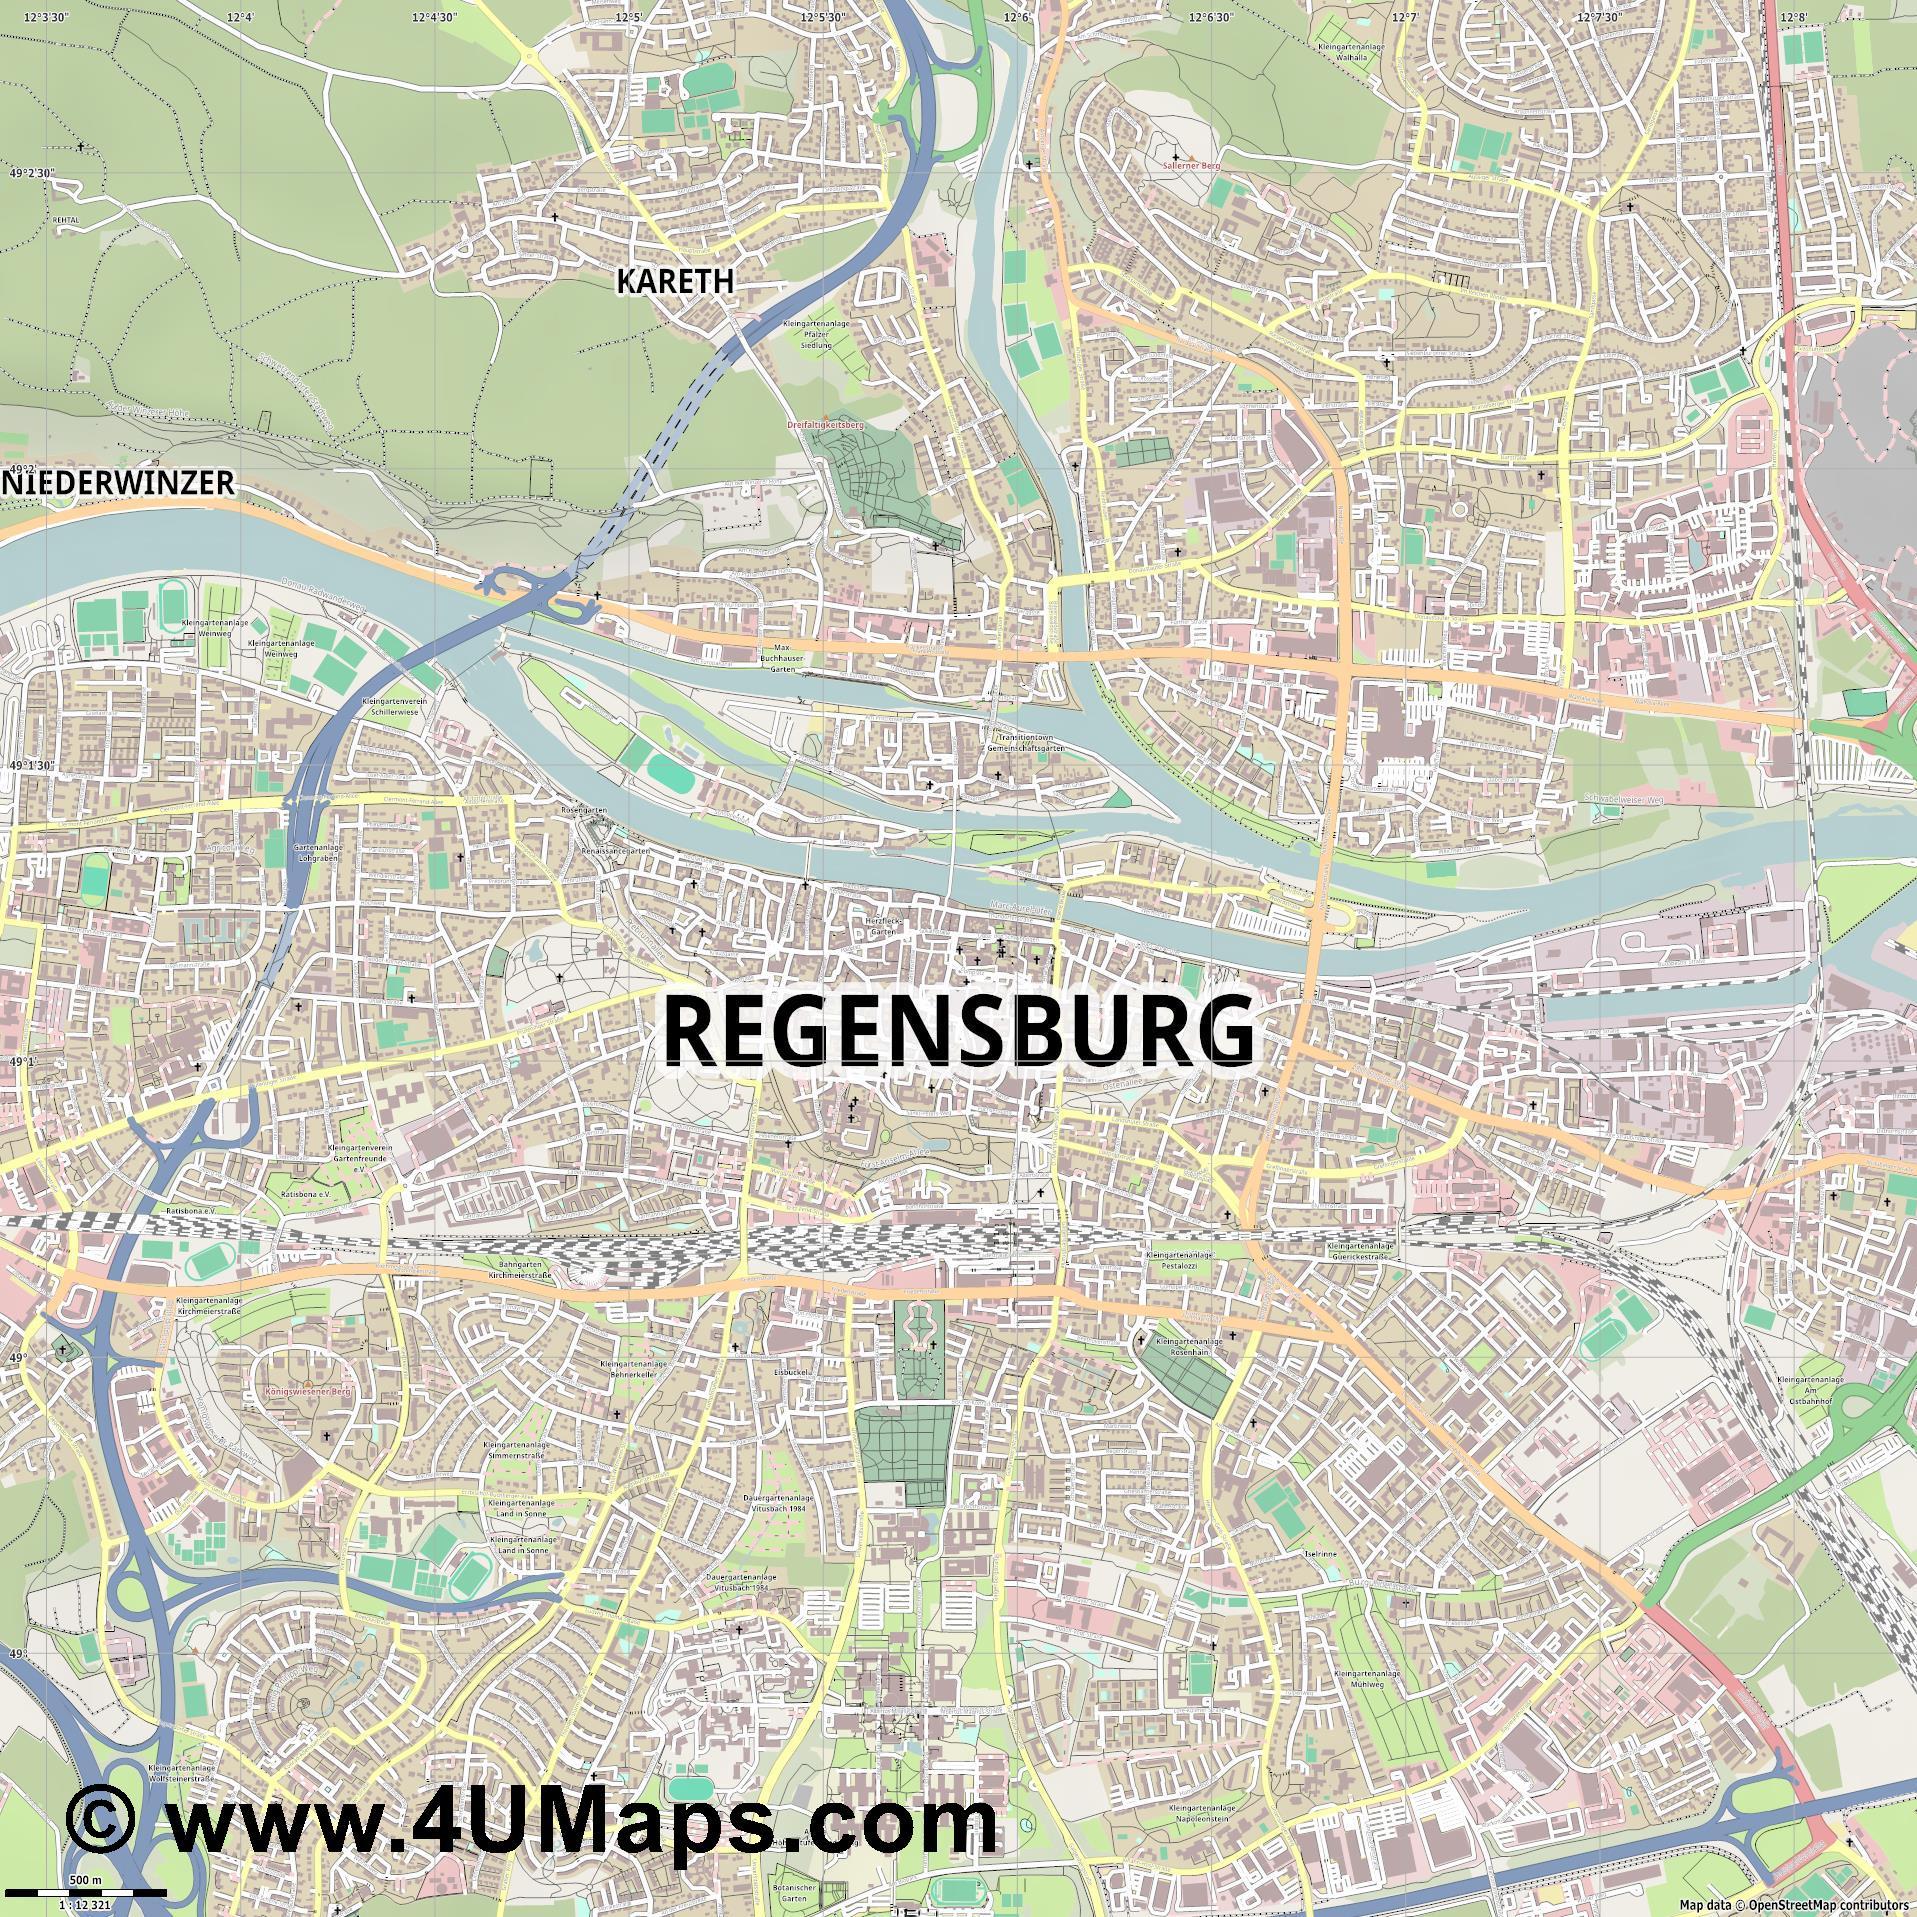 Svg Scalable Vector City Map Regensburg - Regensburg map